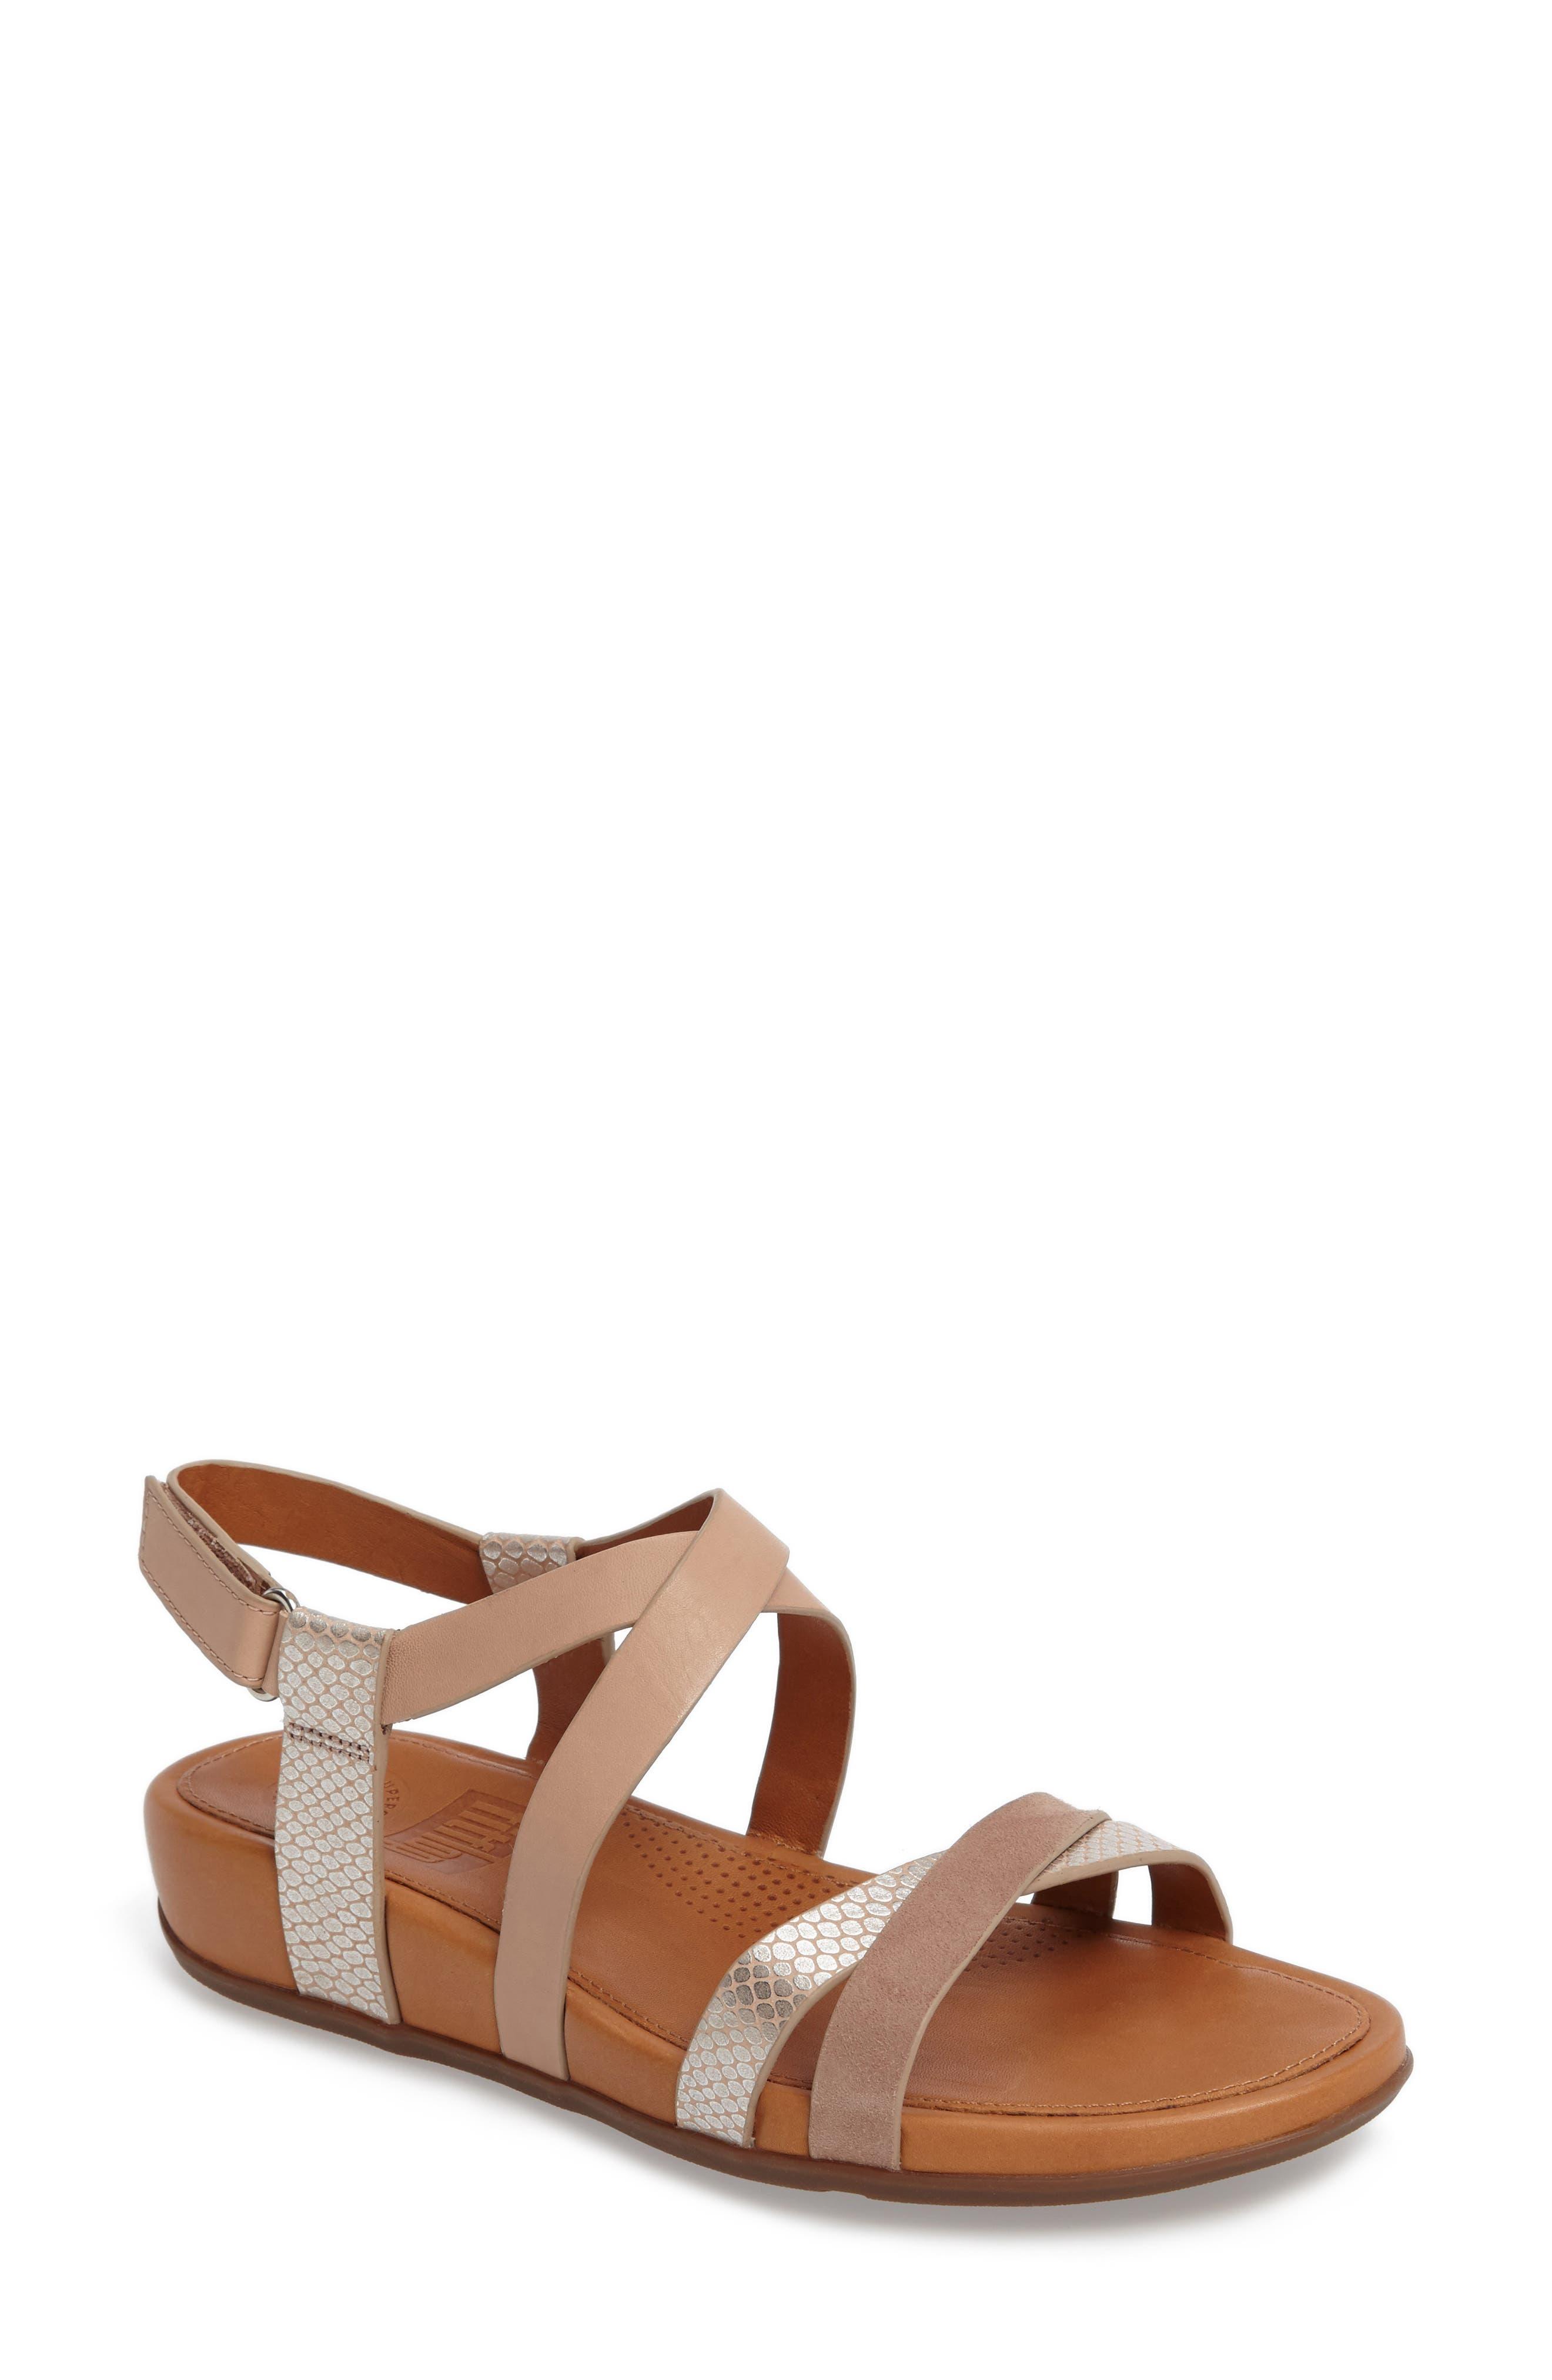 Main Image - FitFlop Lumy Crisscross Sandal (Women)